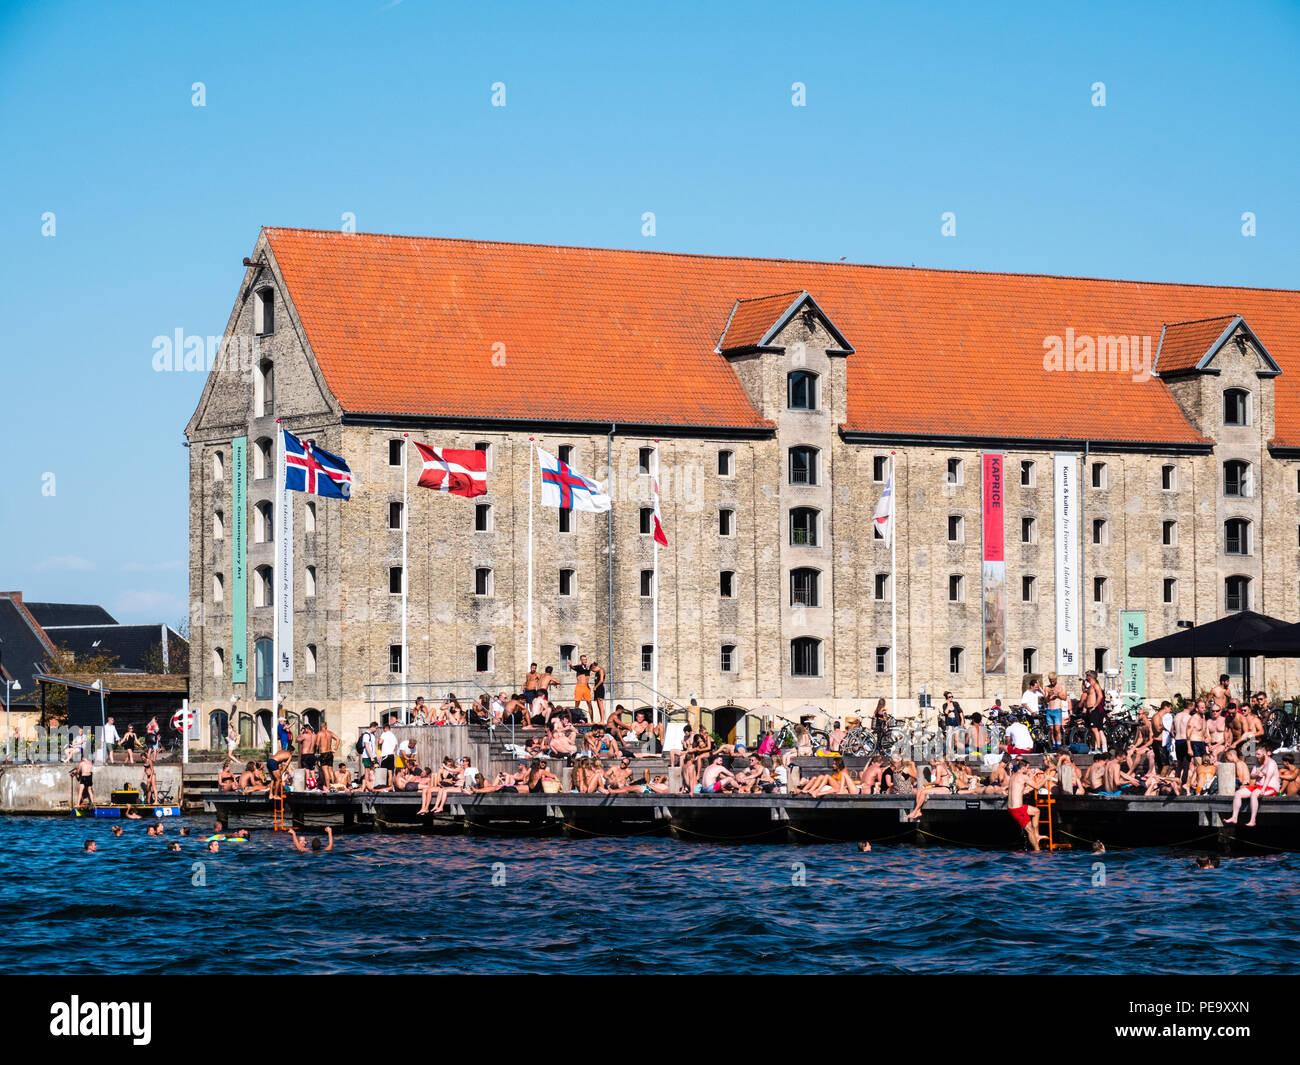 Swimmers and Sunbathers, North Atlantic House Arts Center Nordatlantens Brygge, Copenhagen, Zealand, Denmark, Europe. - Stock Image